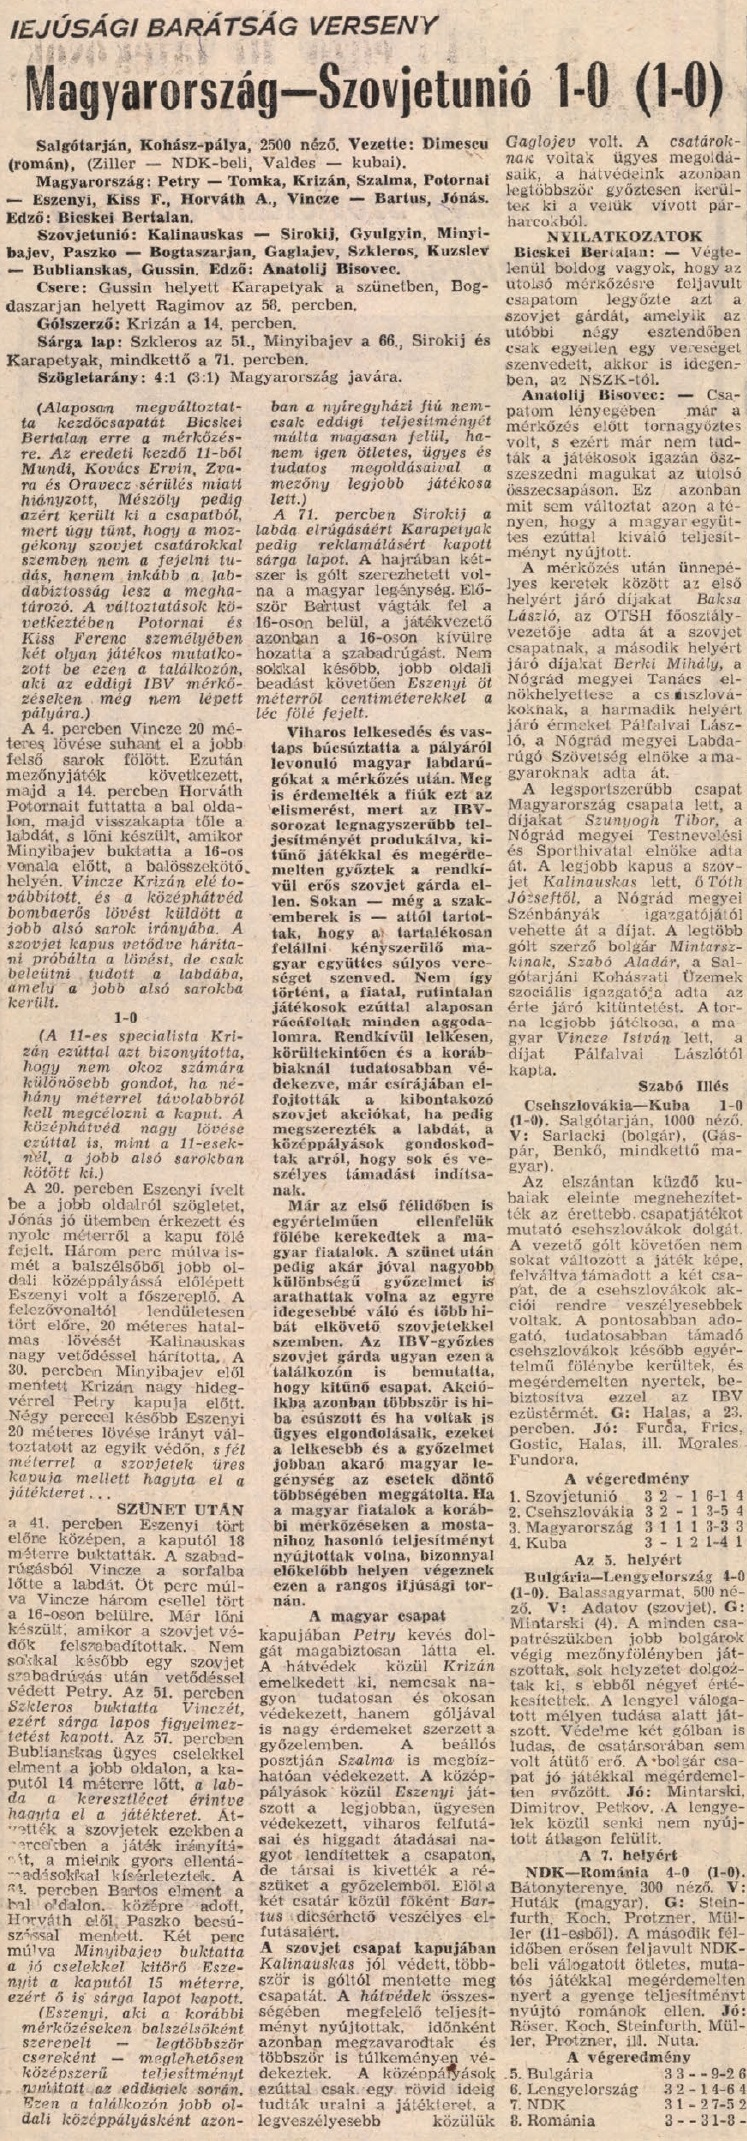 idokapszula_nb_i_1983_84_tavaszi_zaras_merlegen_az_alsohaz_ibv_magyarorszag_szovjetunio.jpg